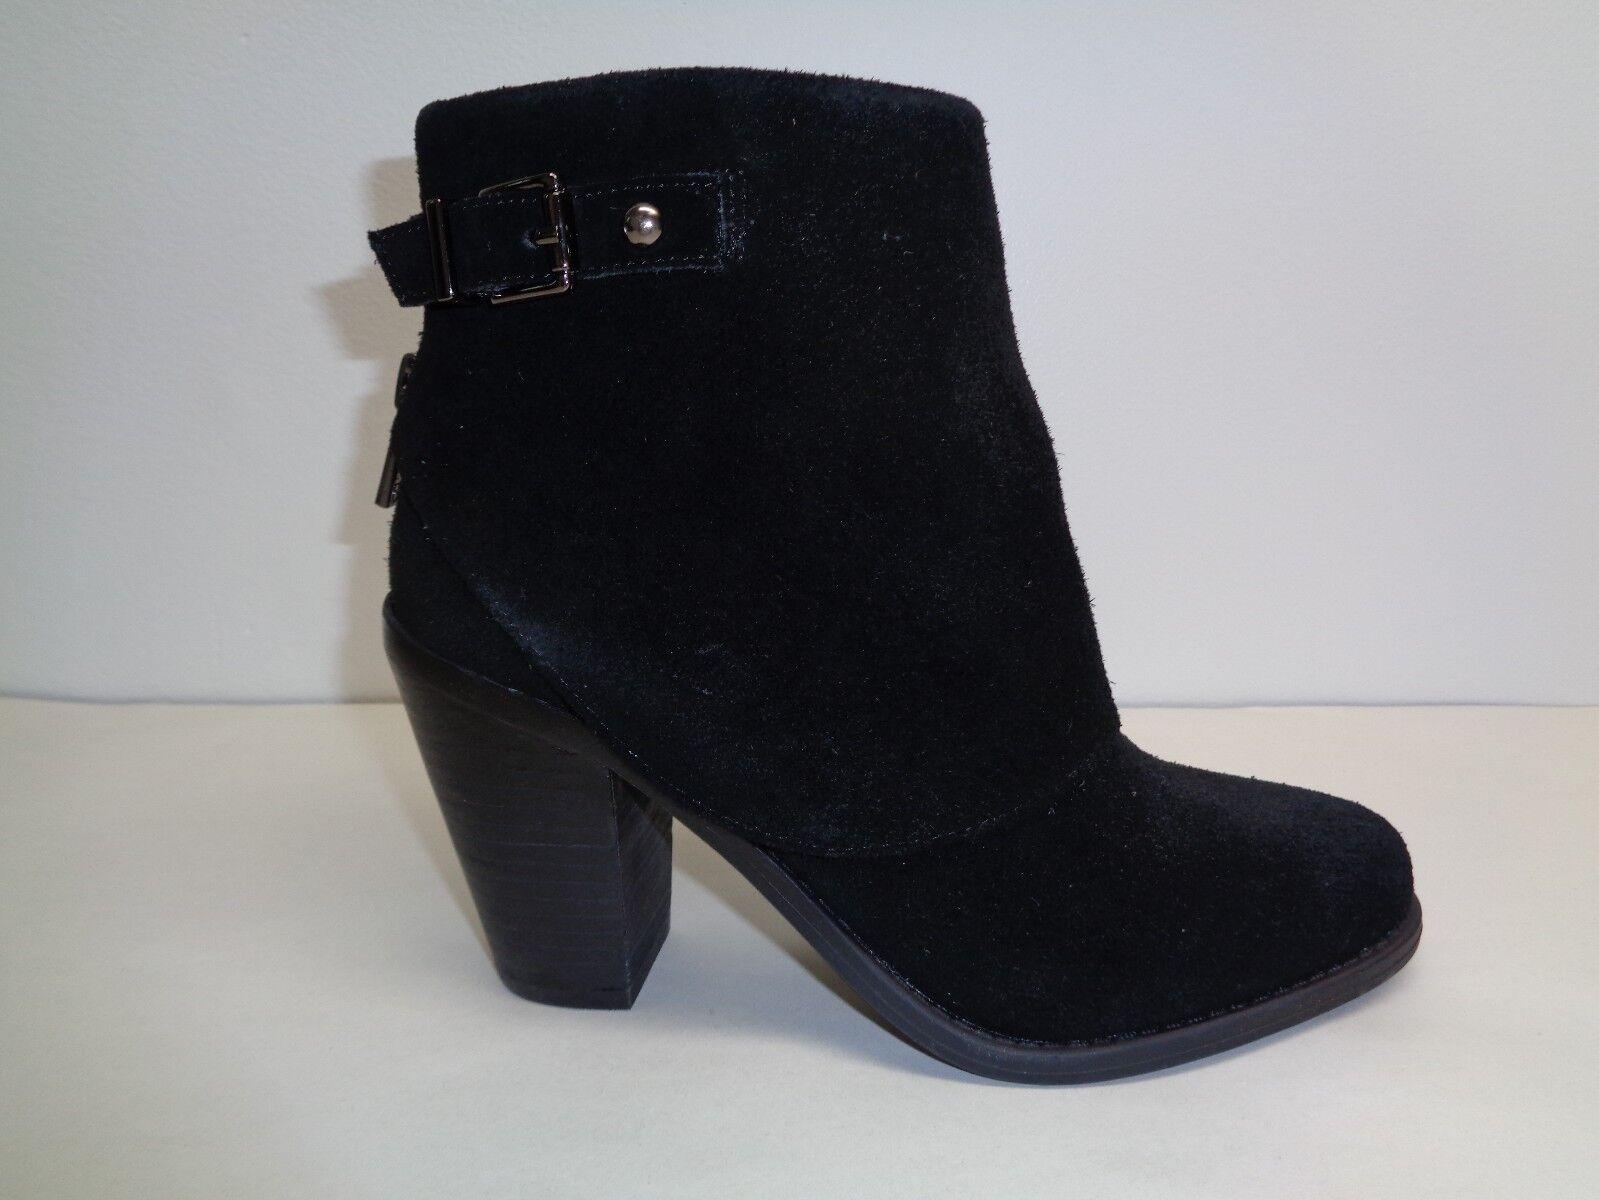 Jessica Simpson Talla 8.5 cassley Negro botas al Tobillo Gamuza Gamuza Gamuza Split Nuevos Zapatos para mujer c65733